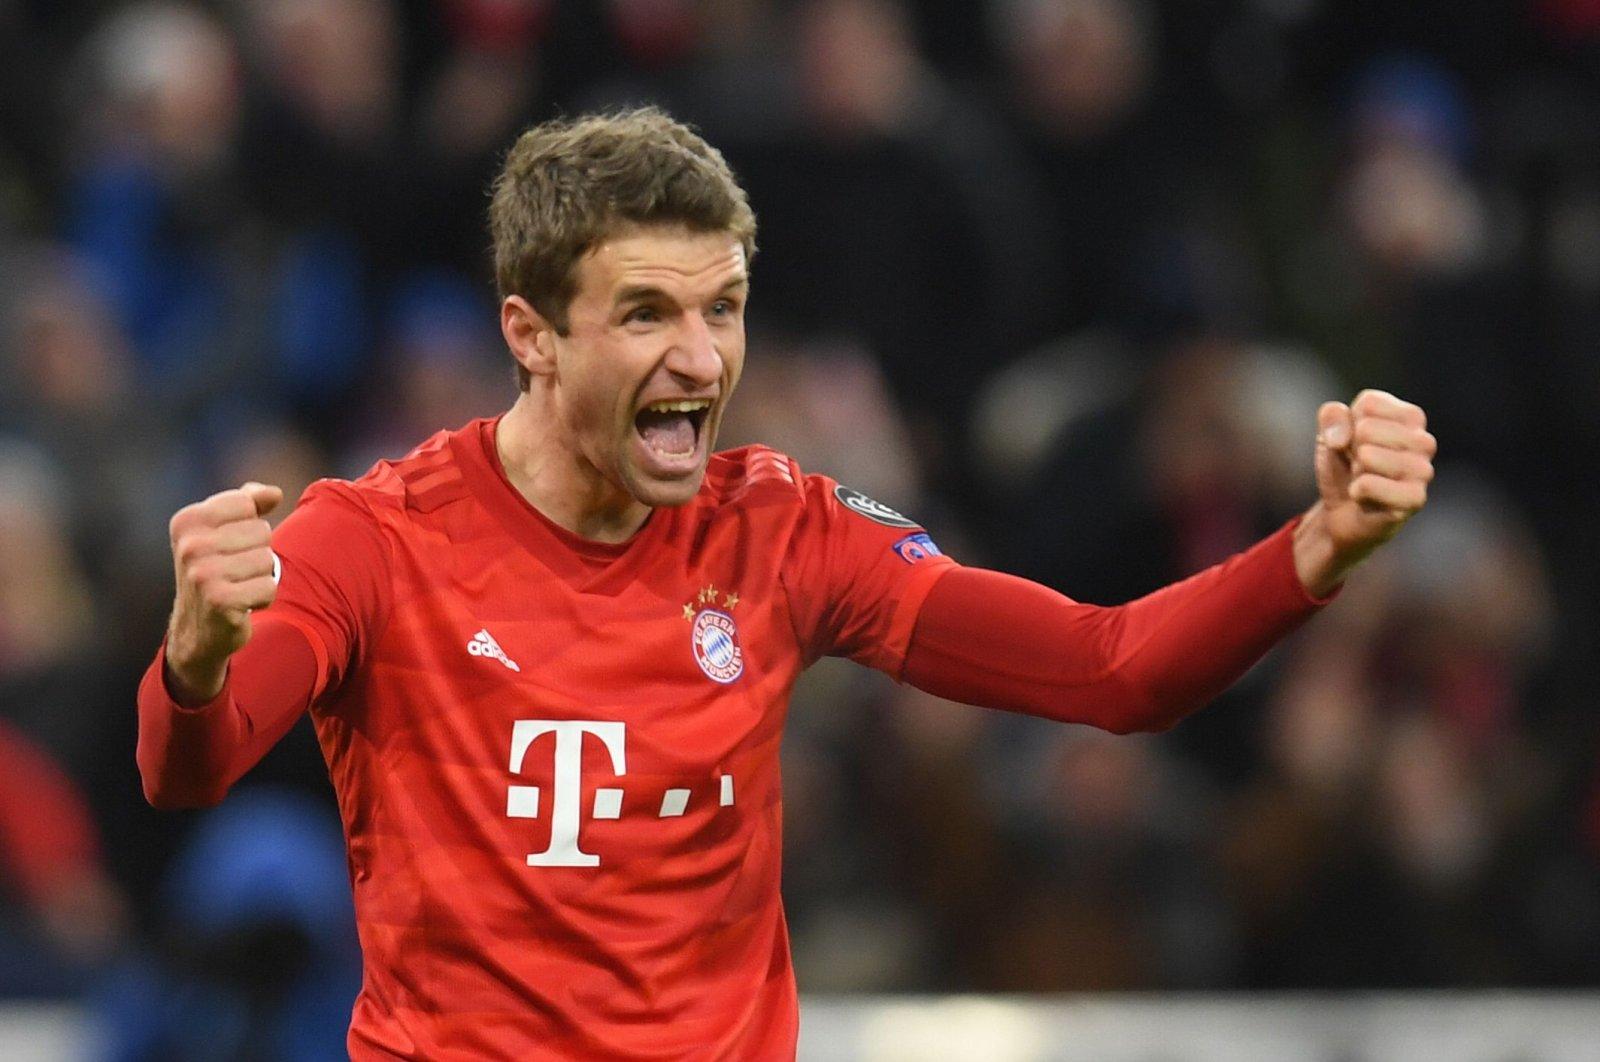 Thomas Müller celebrates a goal during a Champions League match in Munich, Dec. 11, 2019. (AFP Photo)